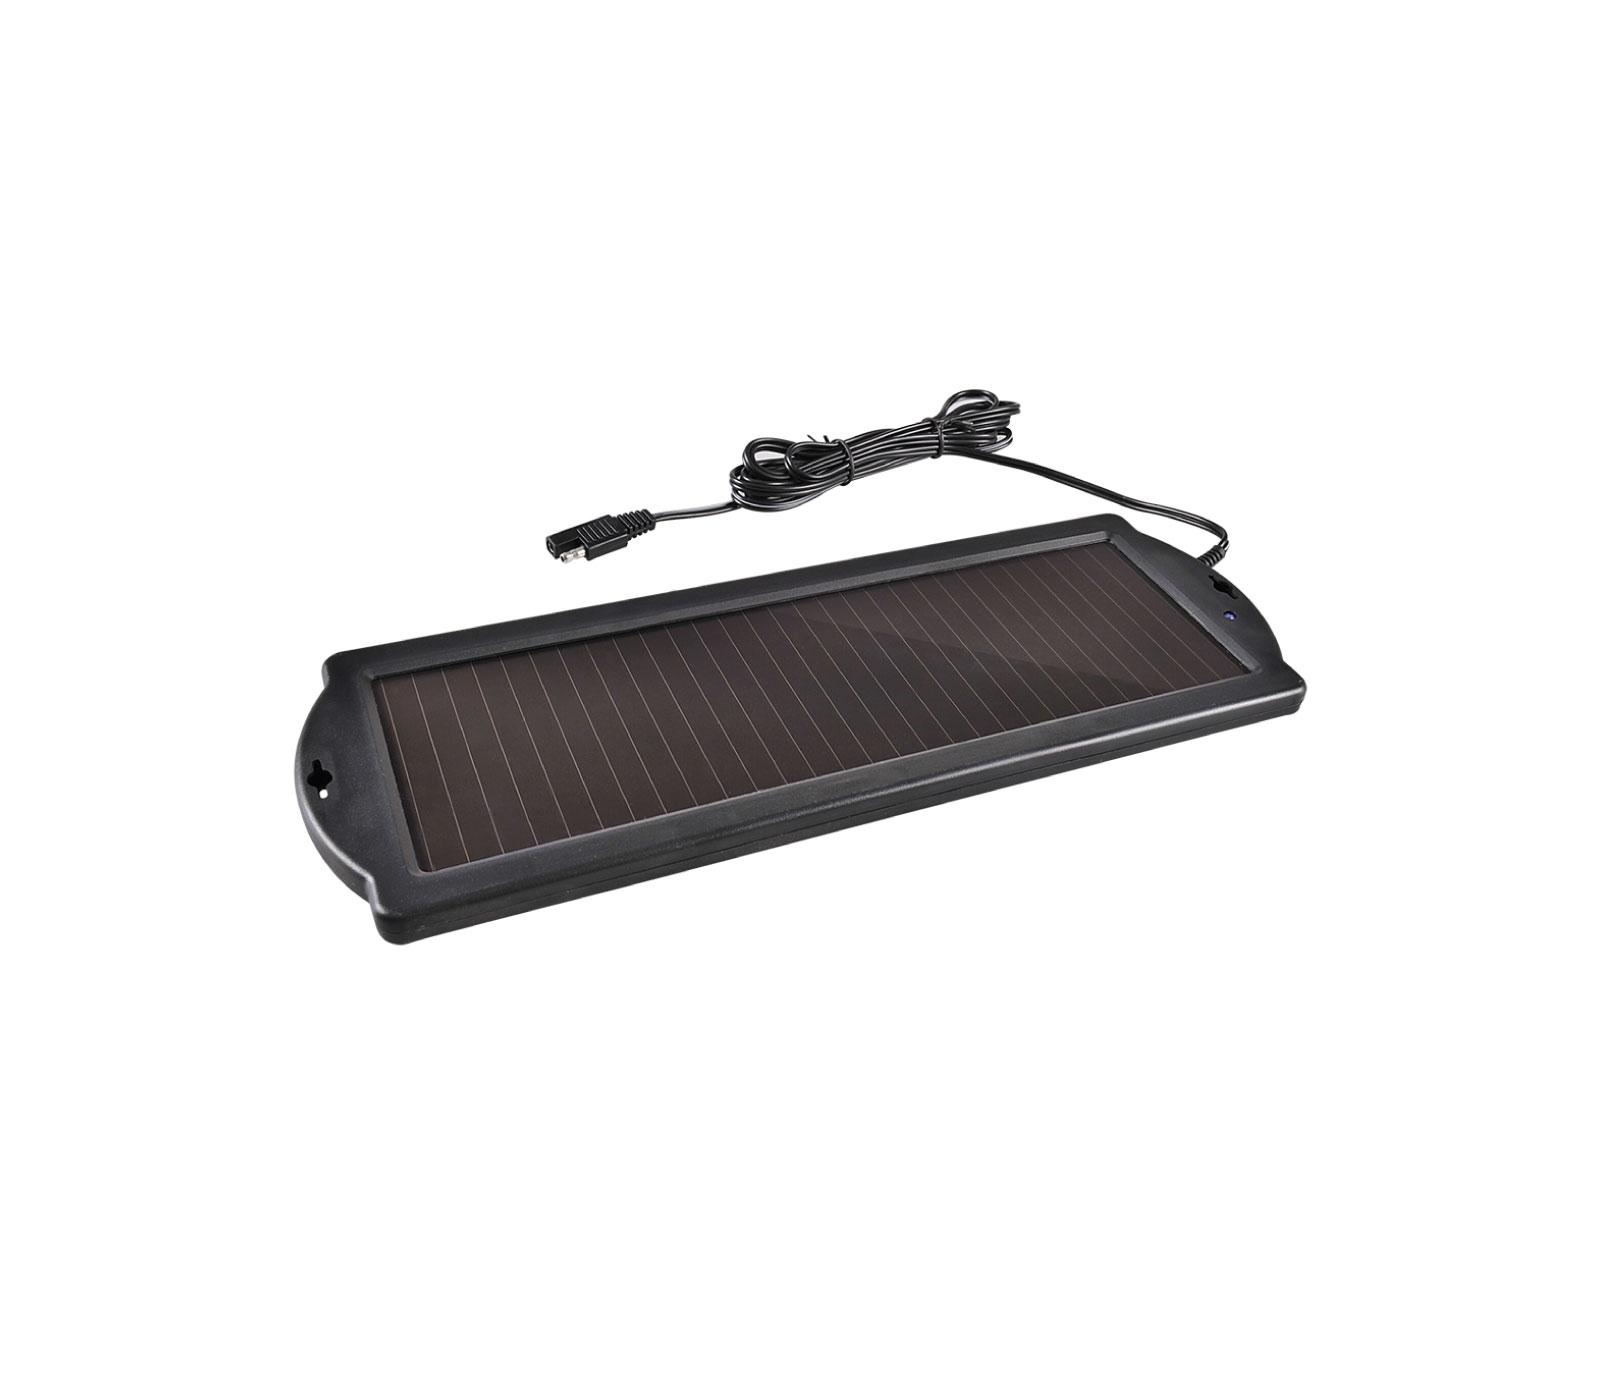 Pro Plus Solar Druppellader